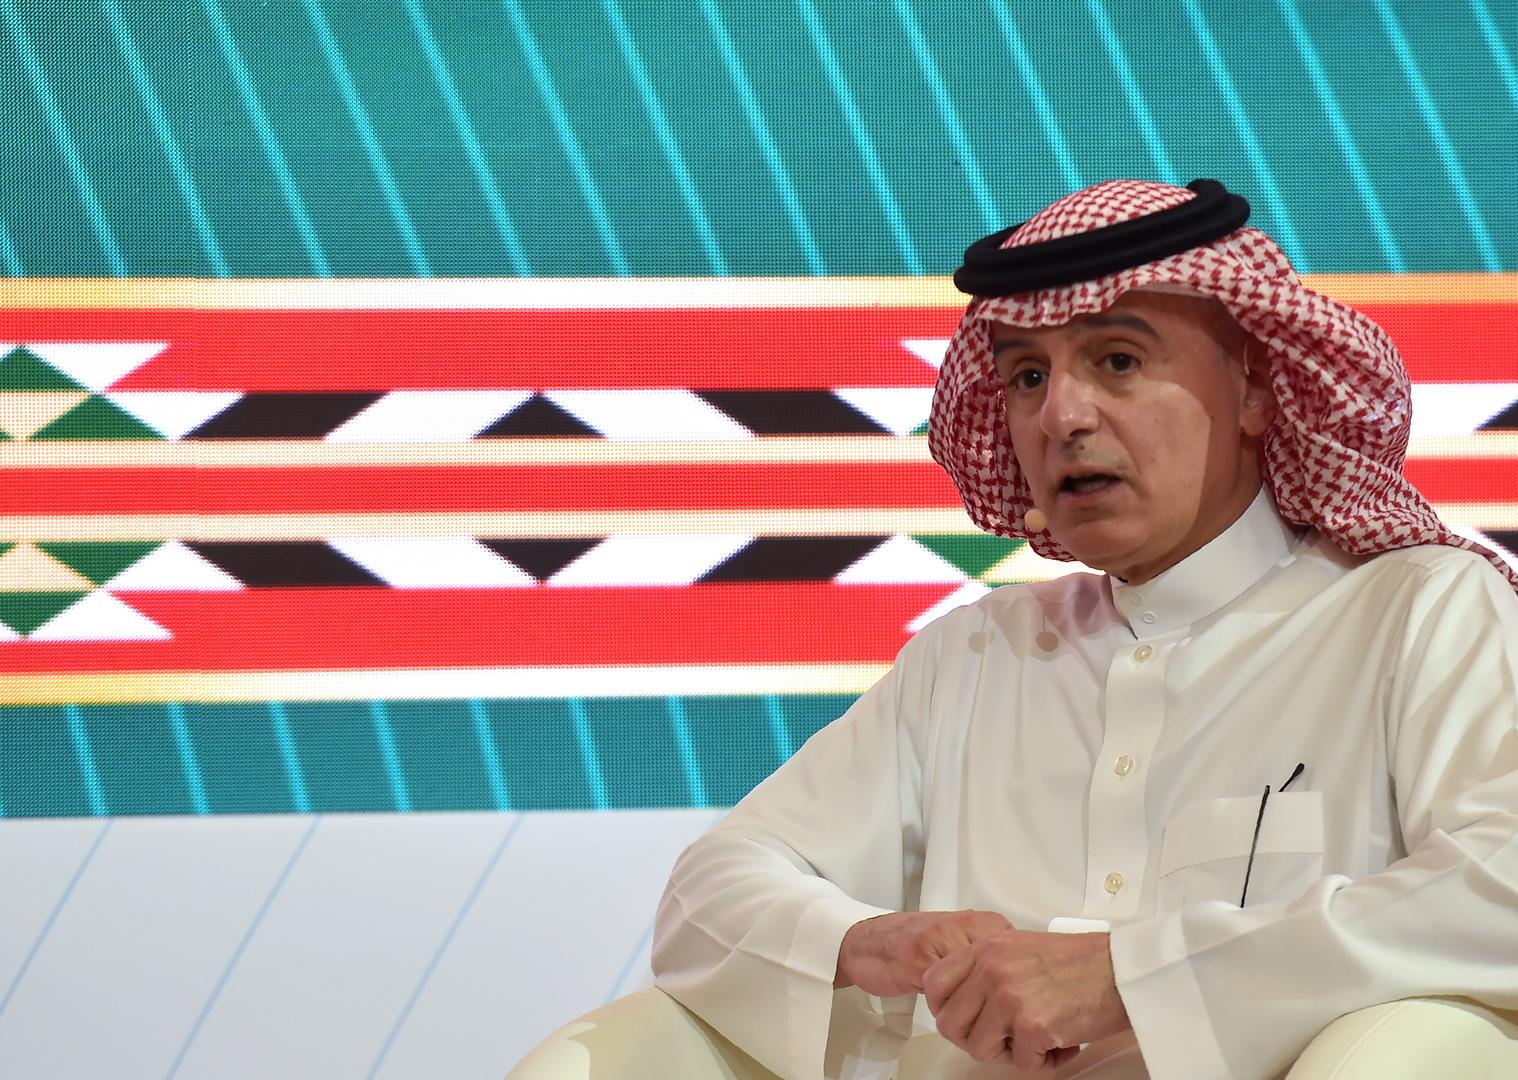 Saudis respond to Hillary Clinton with Al-Jubeir's tongue